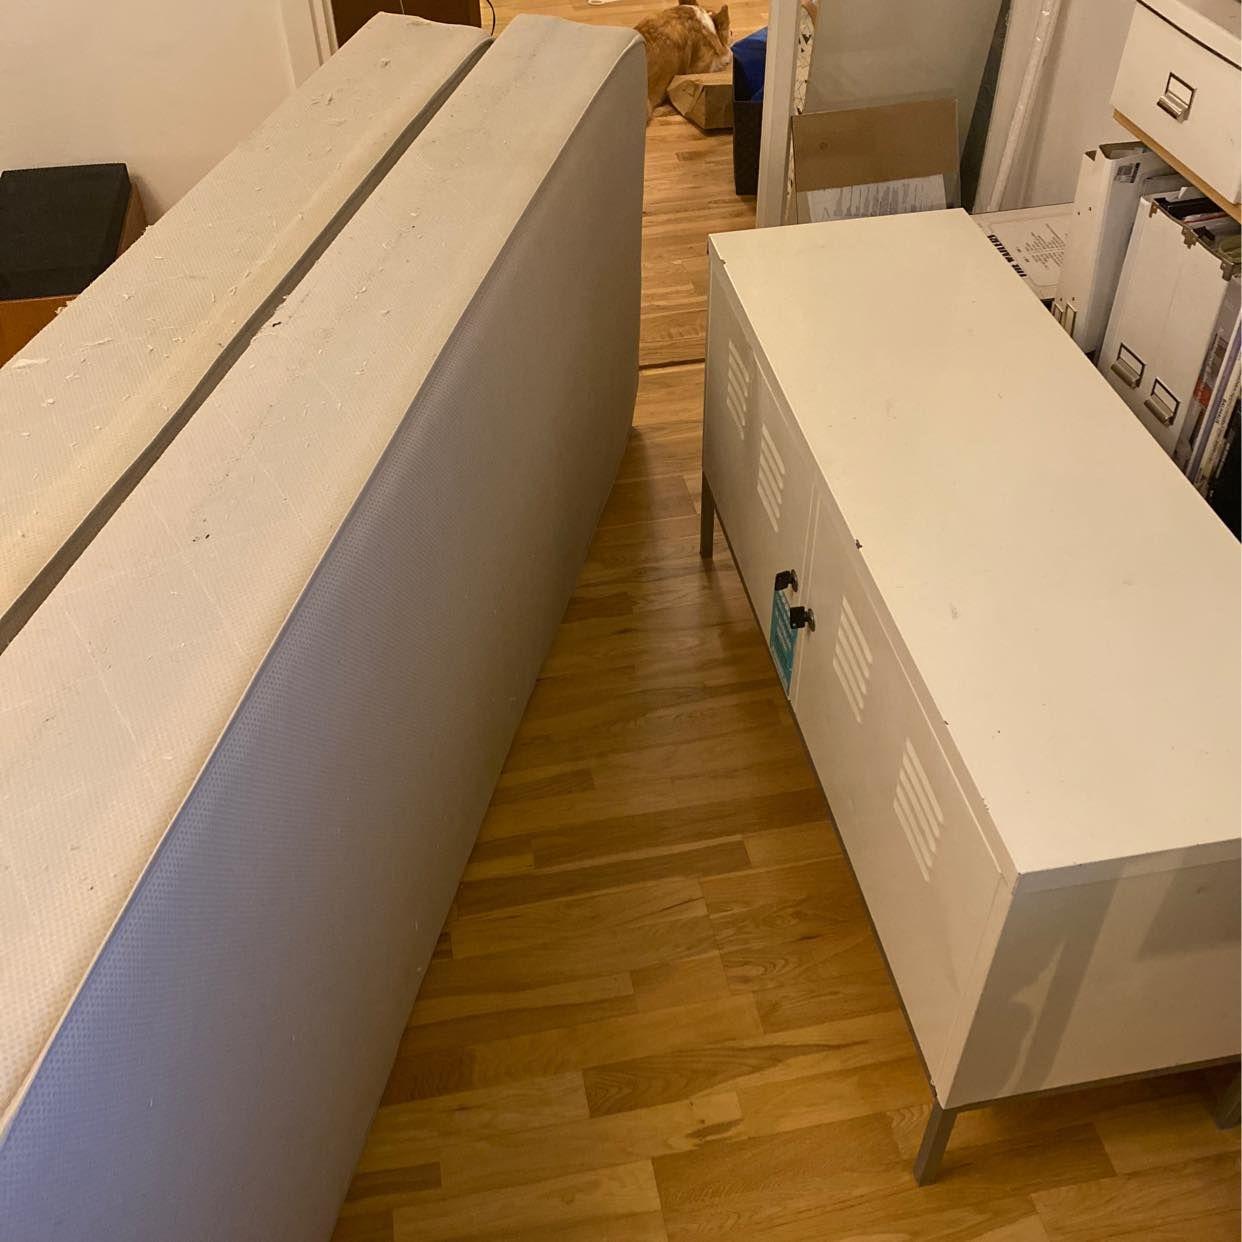 image of 2x80cm madrass + Plåtskåp - Tullinge